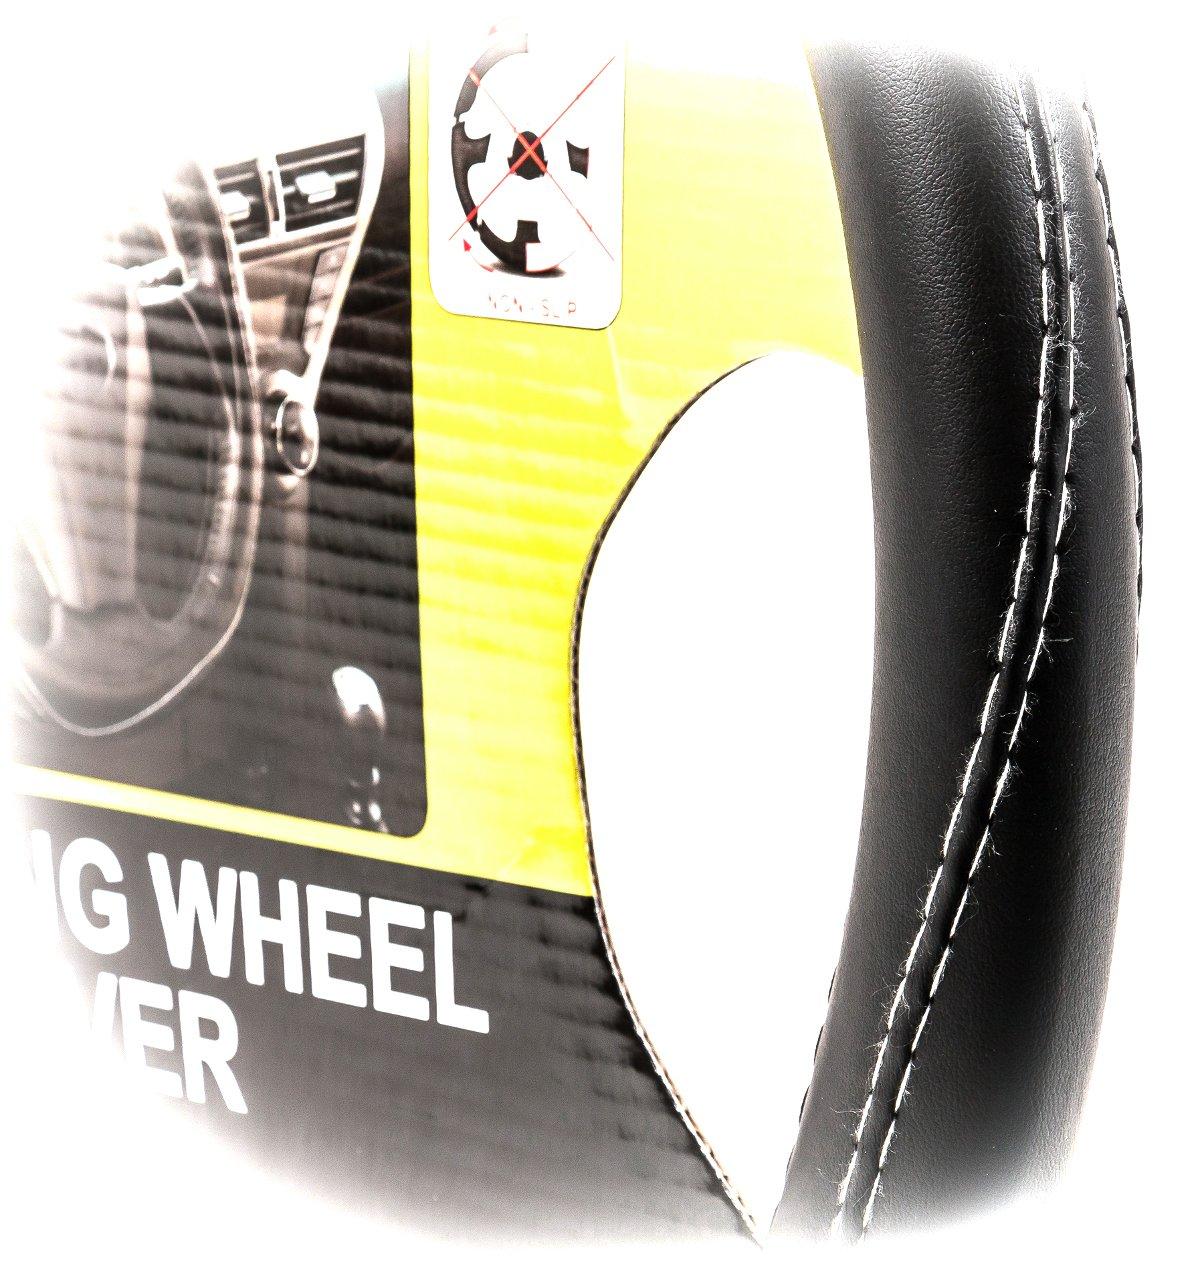 Lifetime Auto Lenkradschoner in Glatt-Leder-Optik mit wei/ßer Ziernaht Gr/ö/ße 38,5 cm